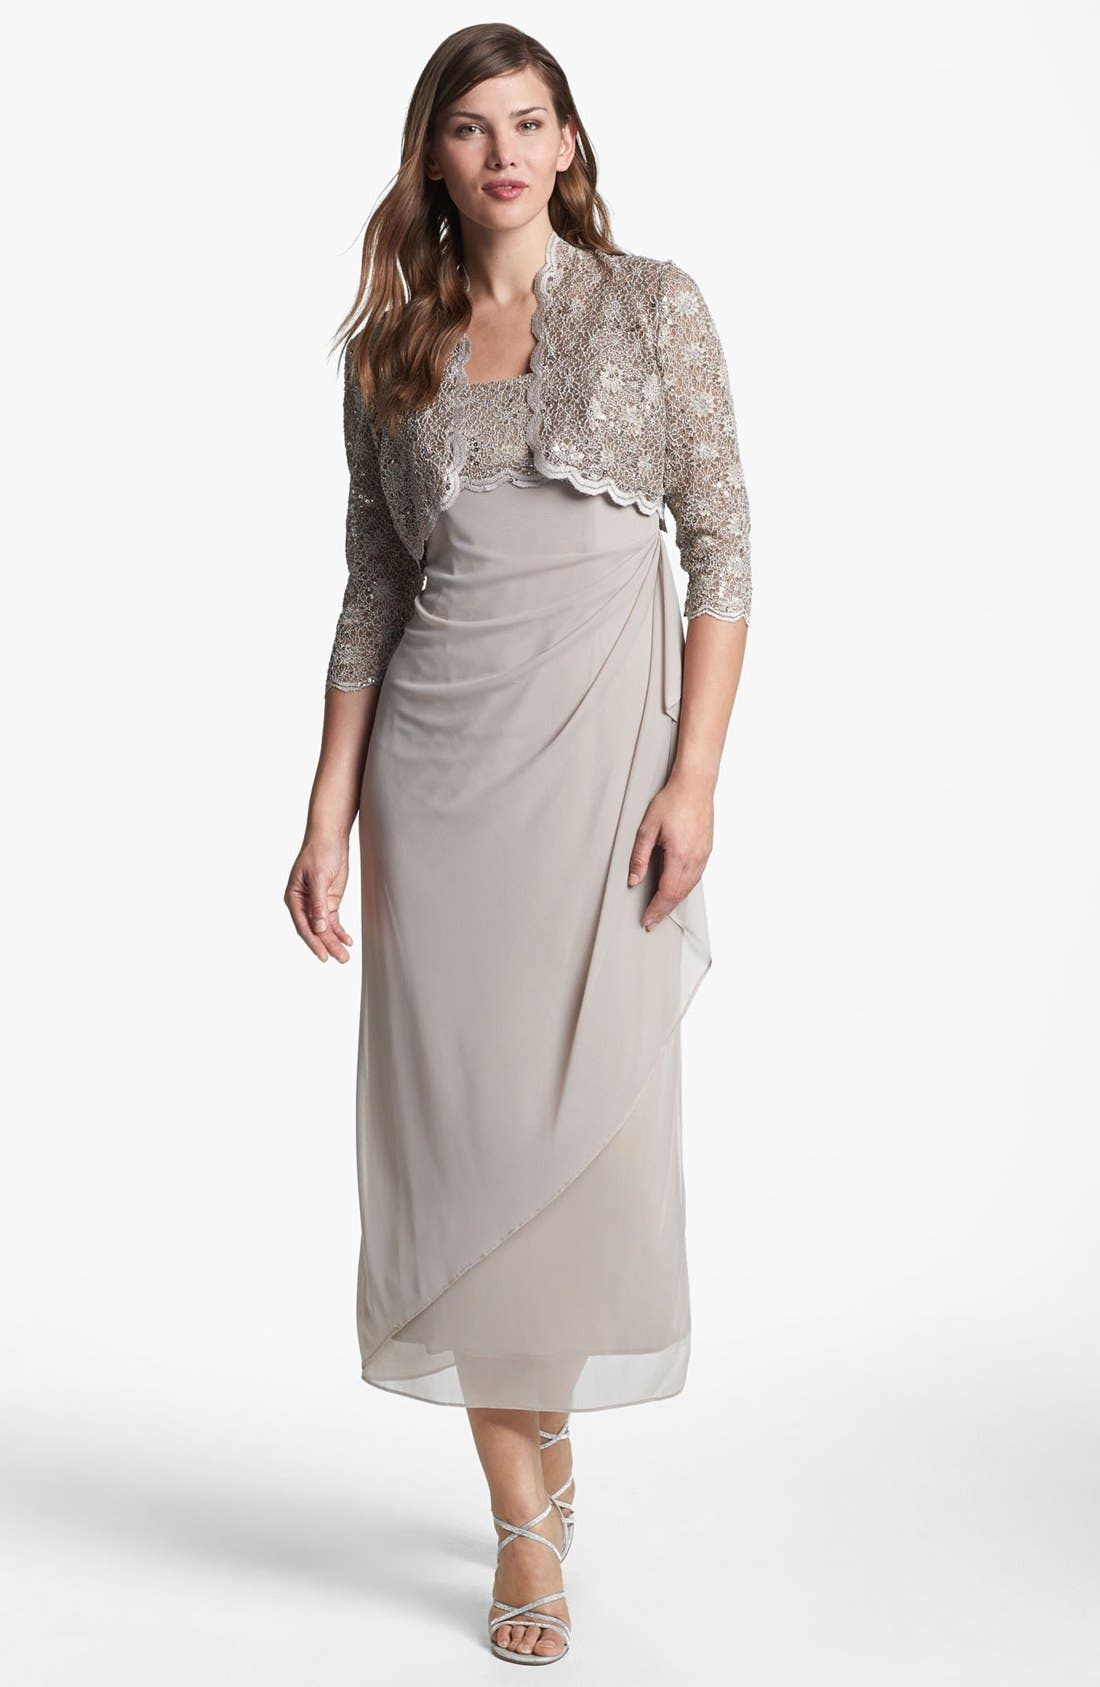 Alternate Image 1 Selected - Alex Evenings Ruched Dress & Bolero (Petite)